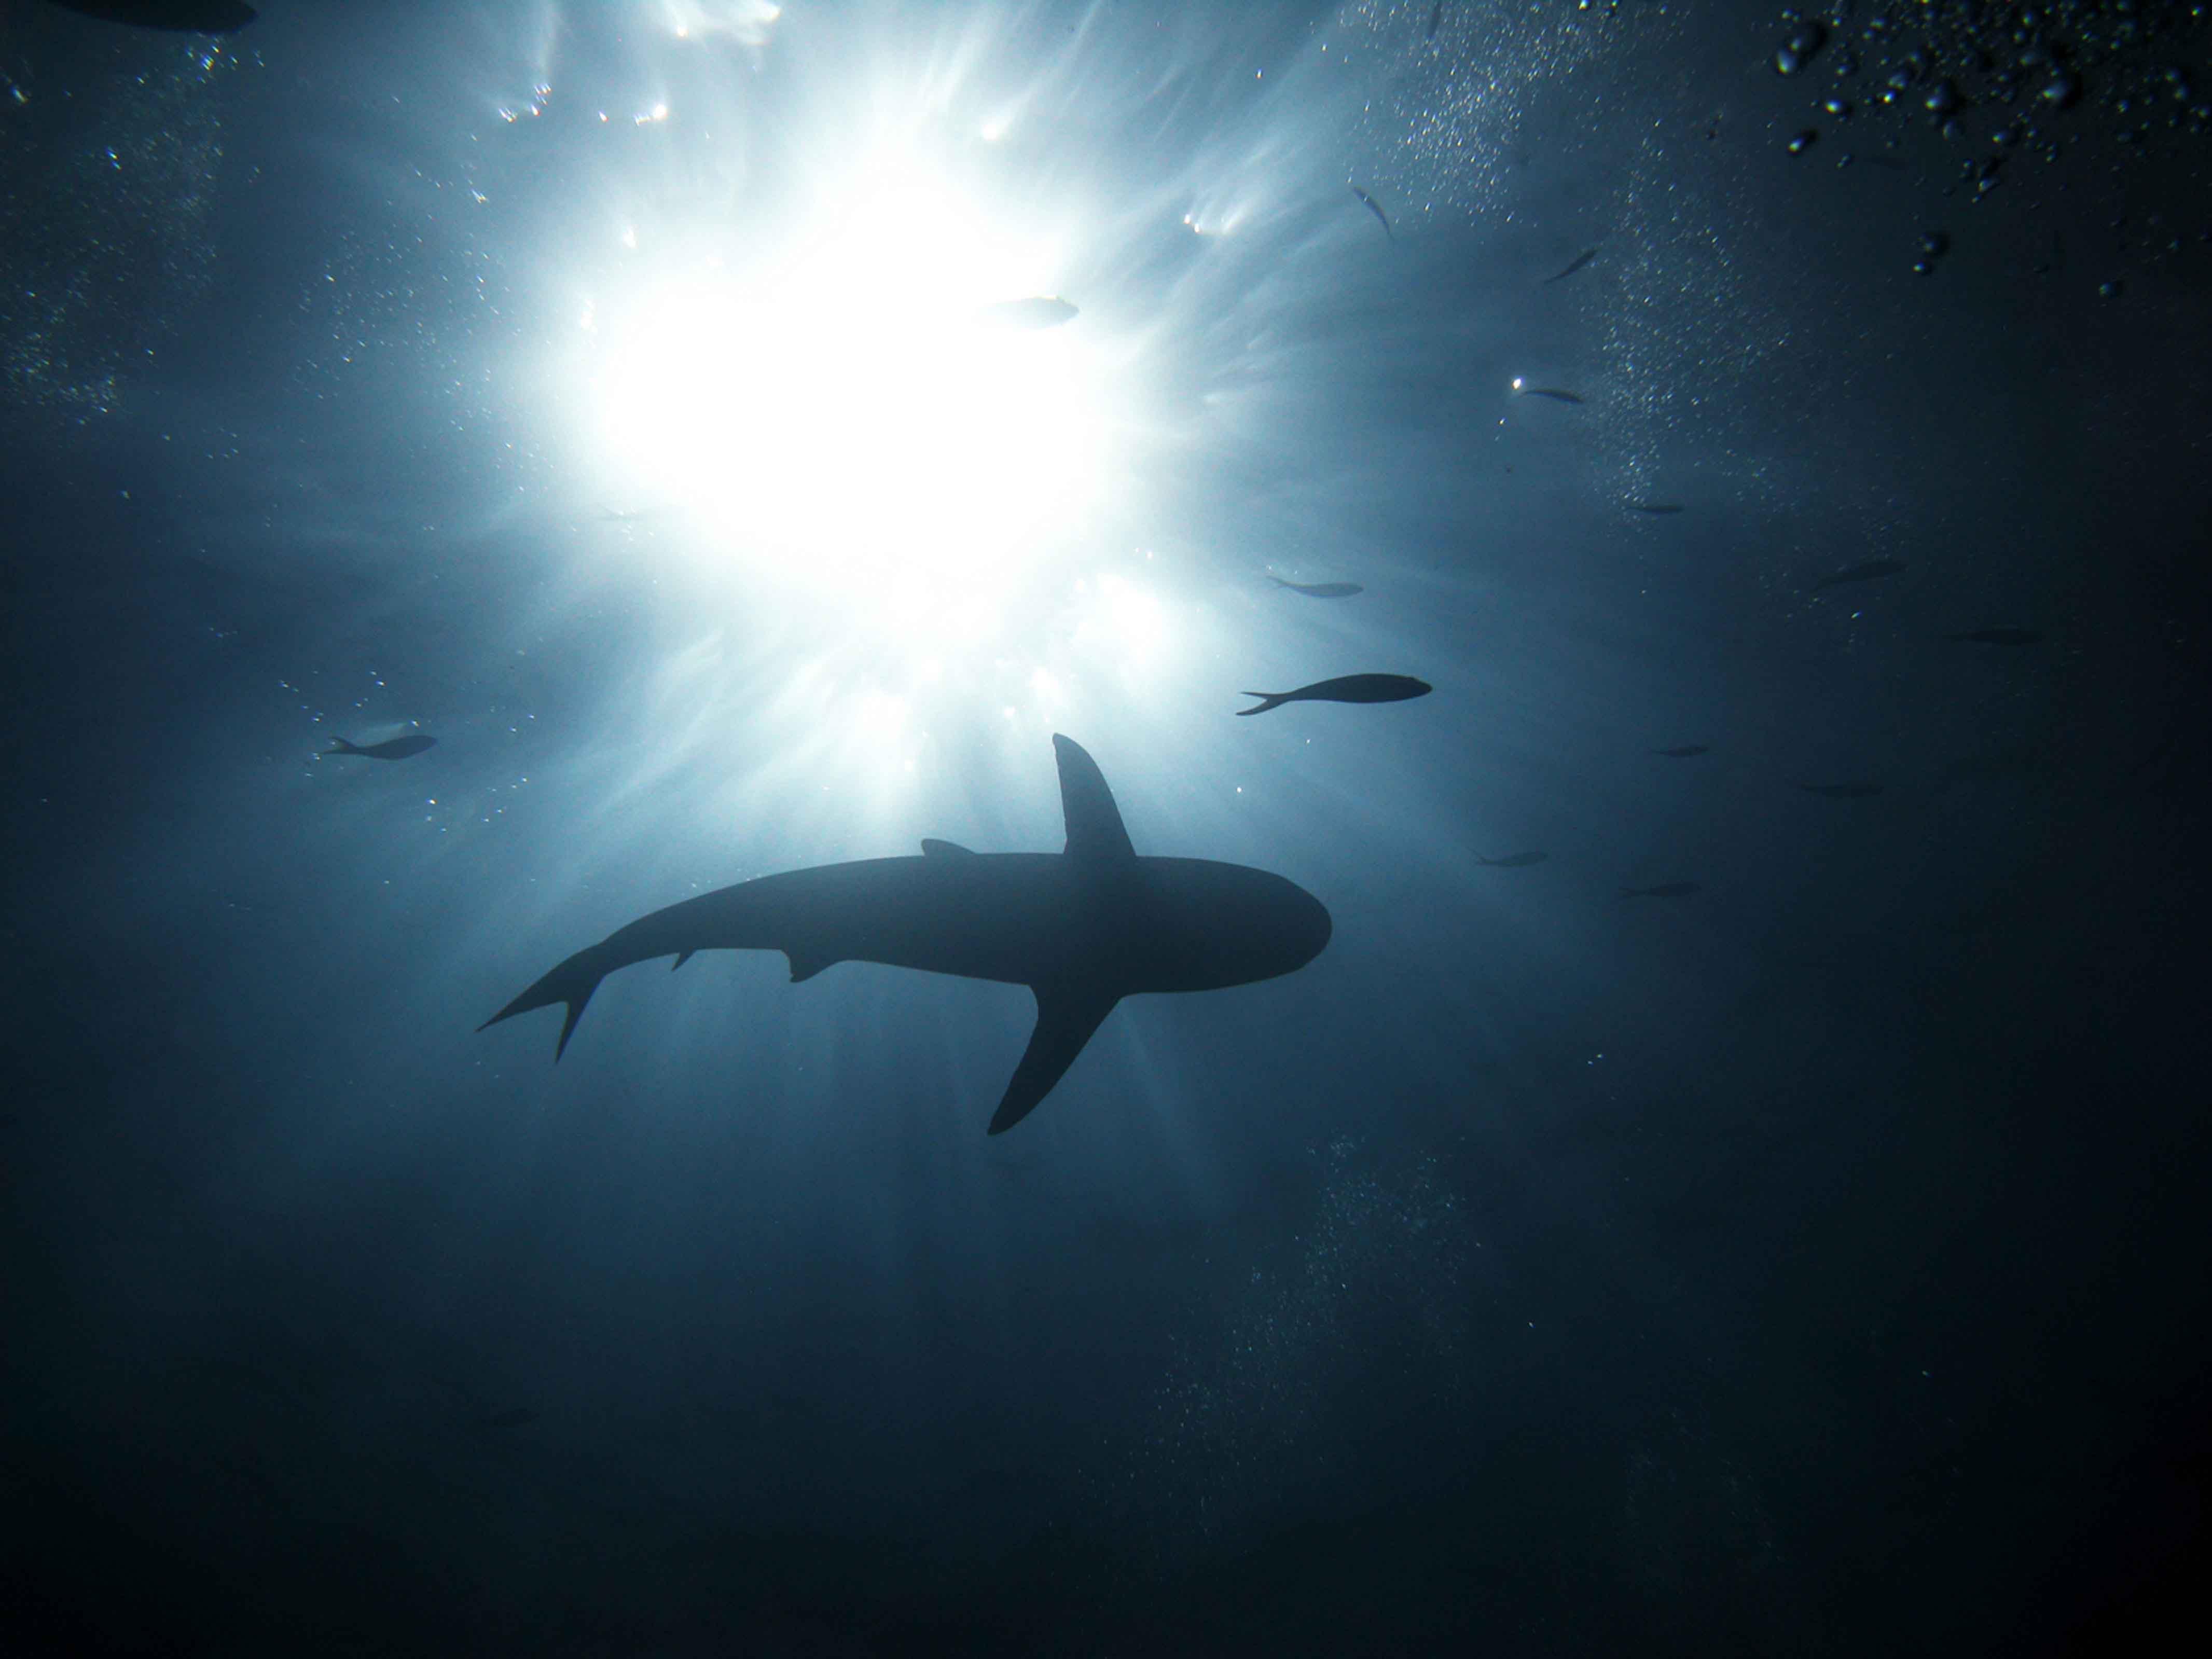 Hd Great White Shark Wallpaper Oceans Scholastic